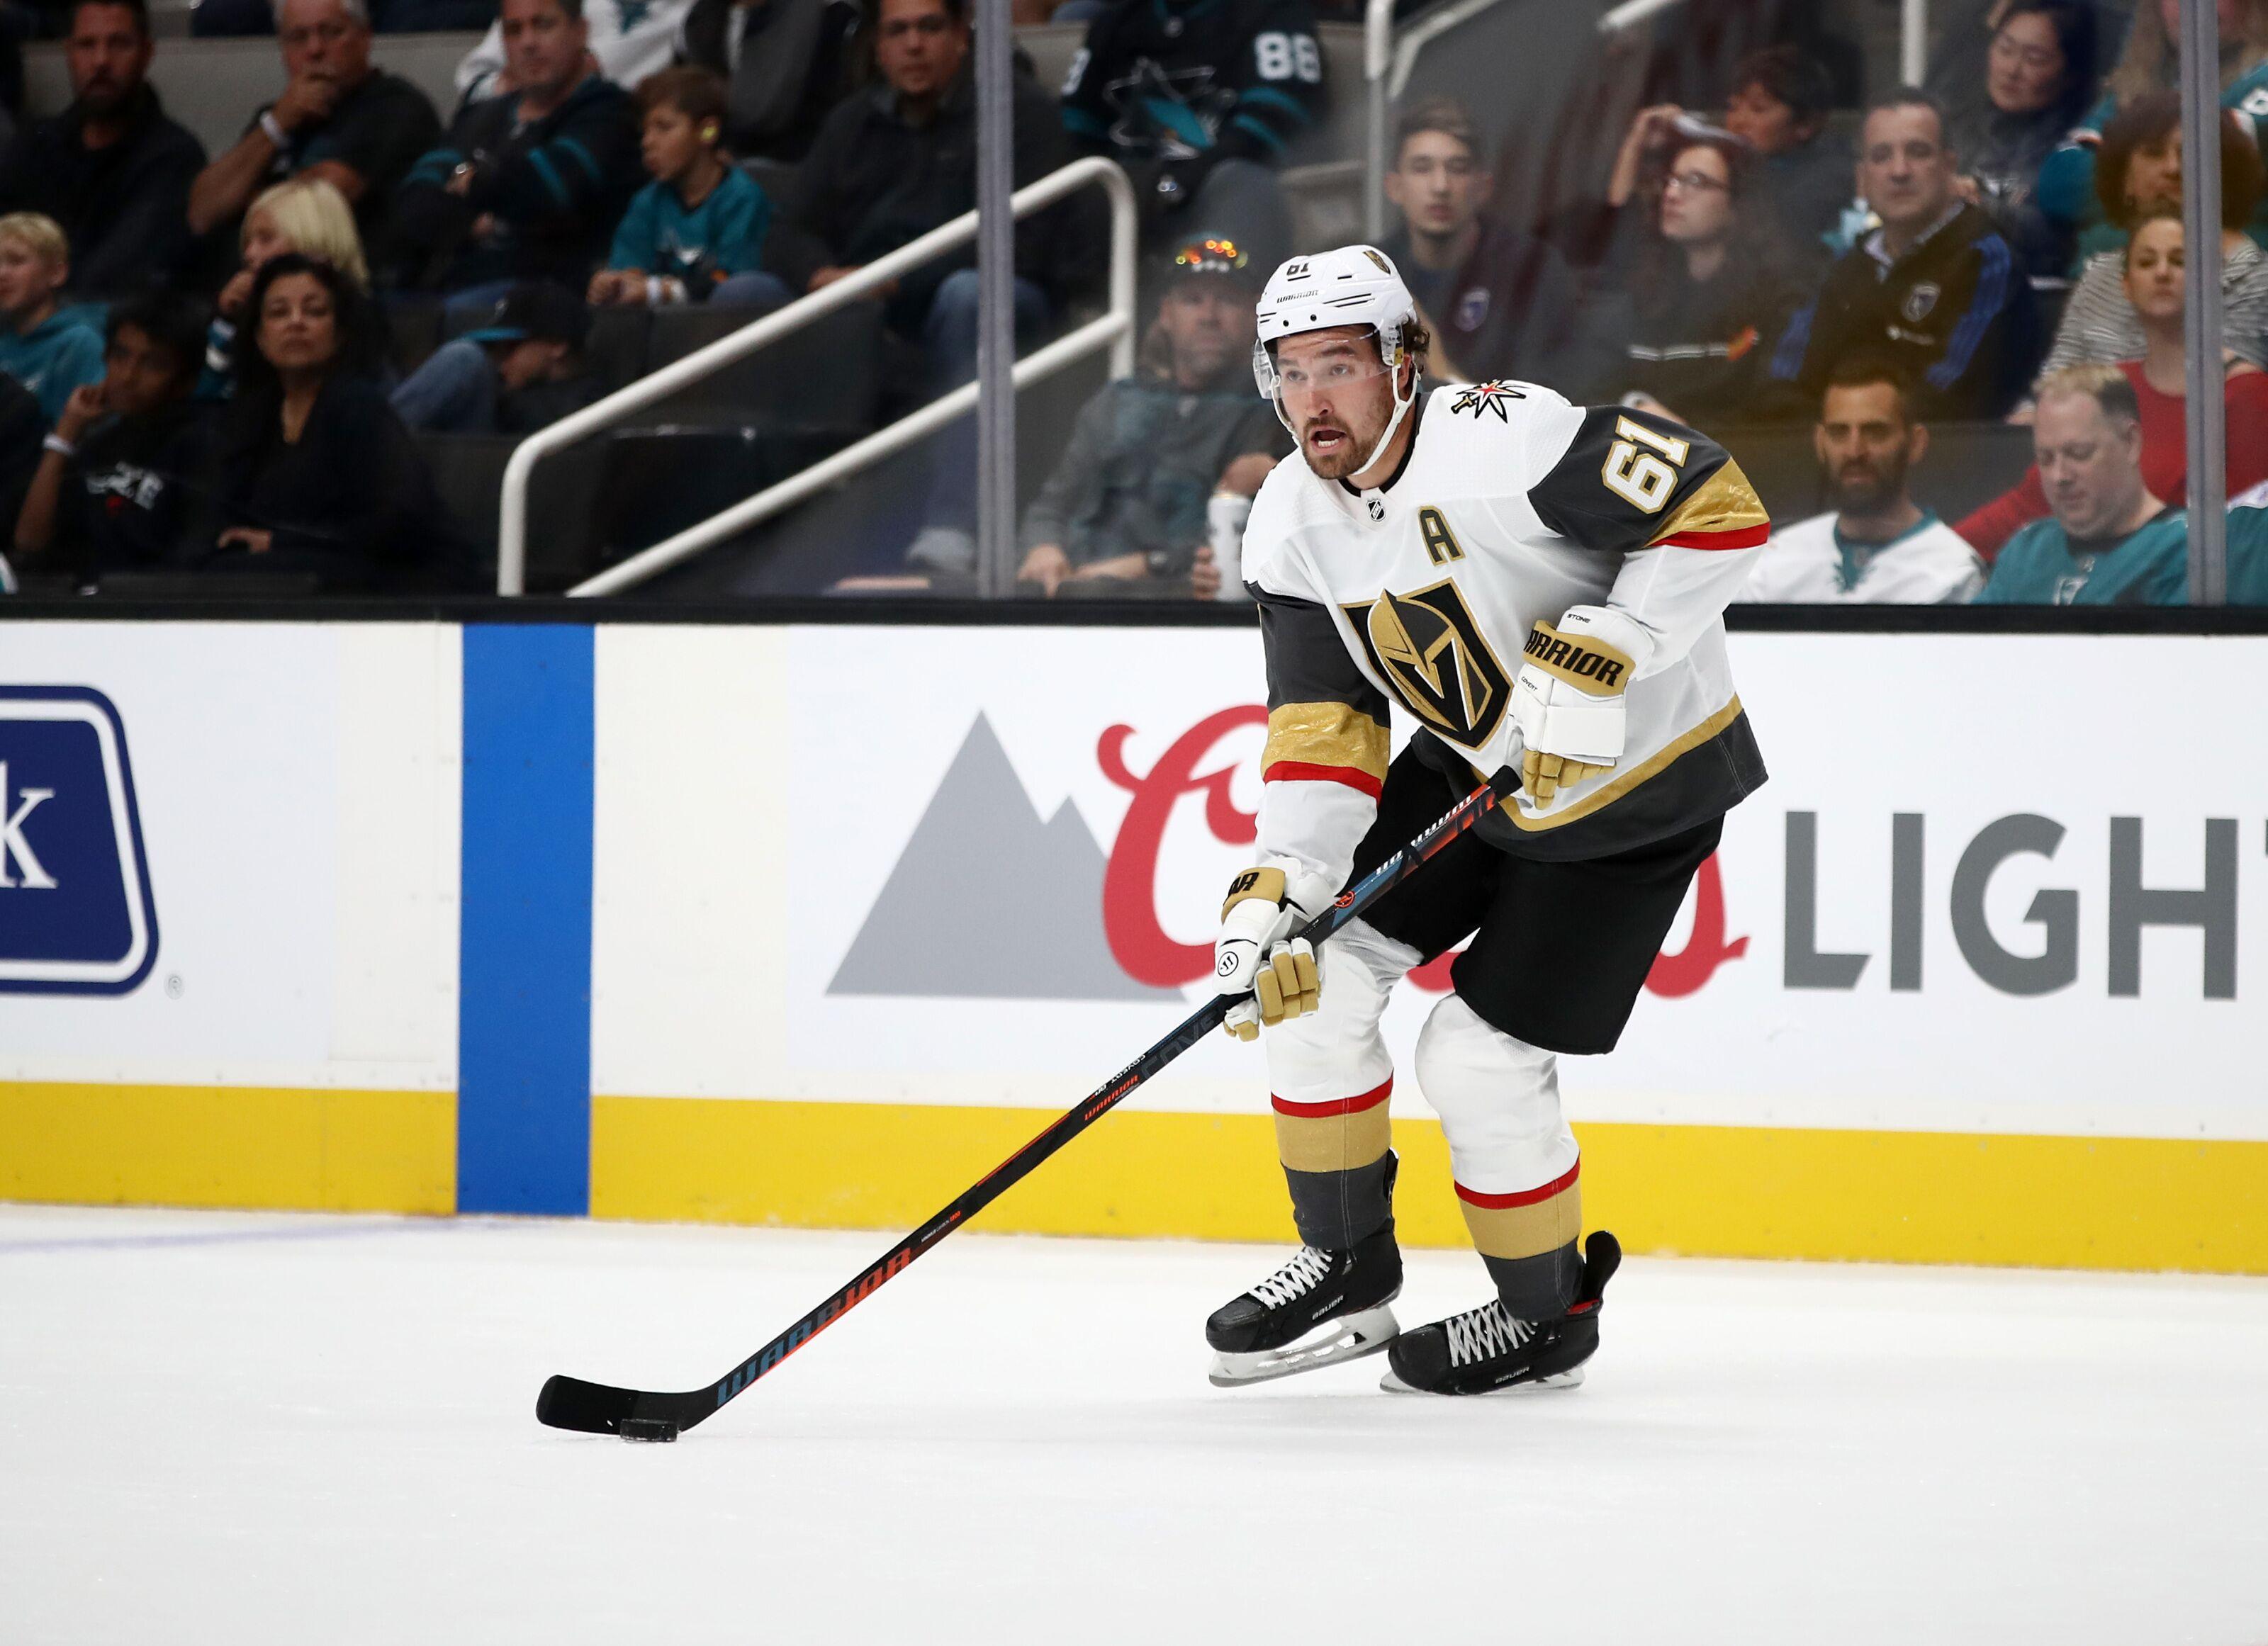 Key matchup Bruins must win vs Golden Knights